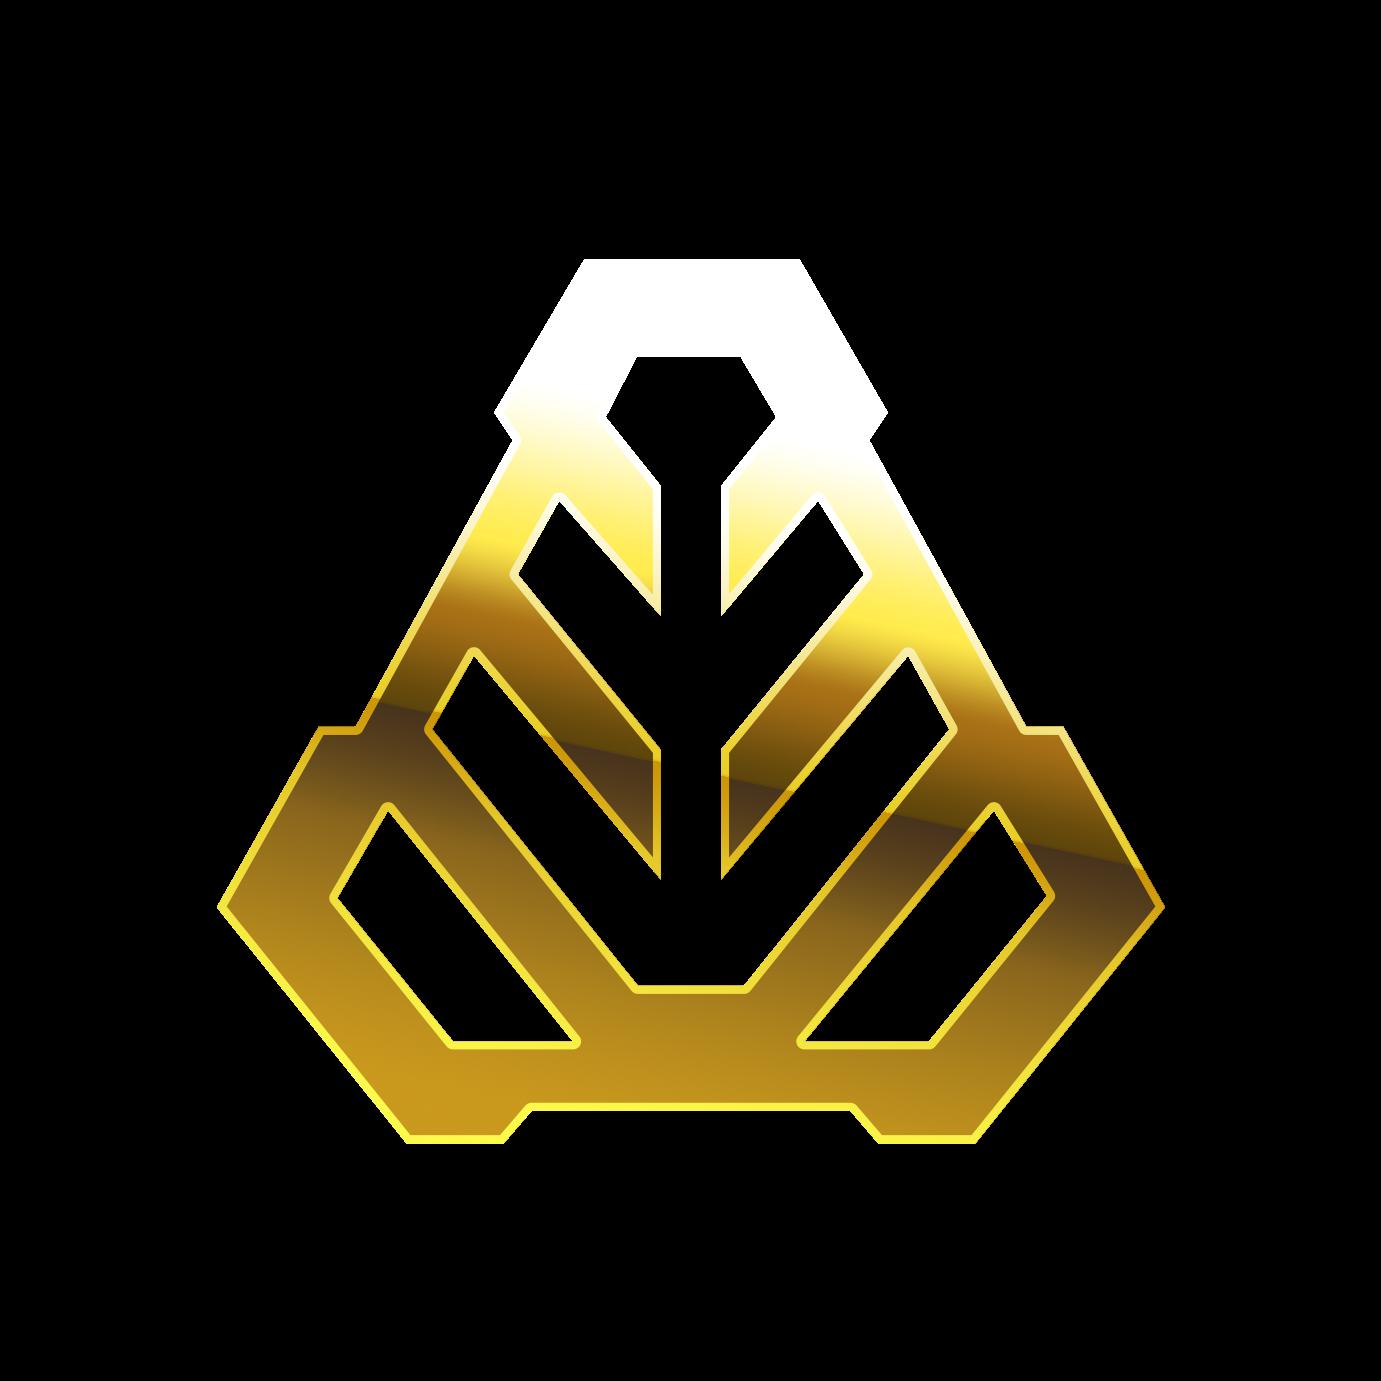 Gold III